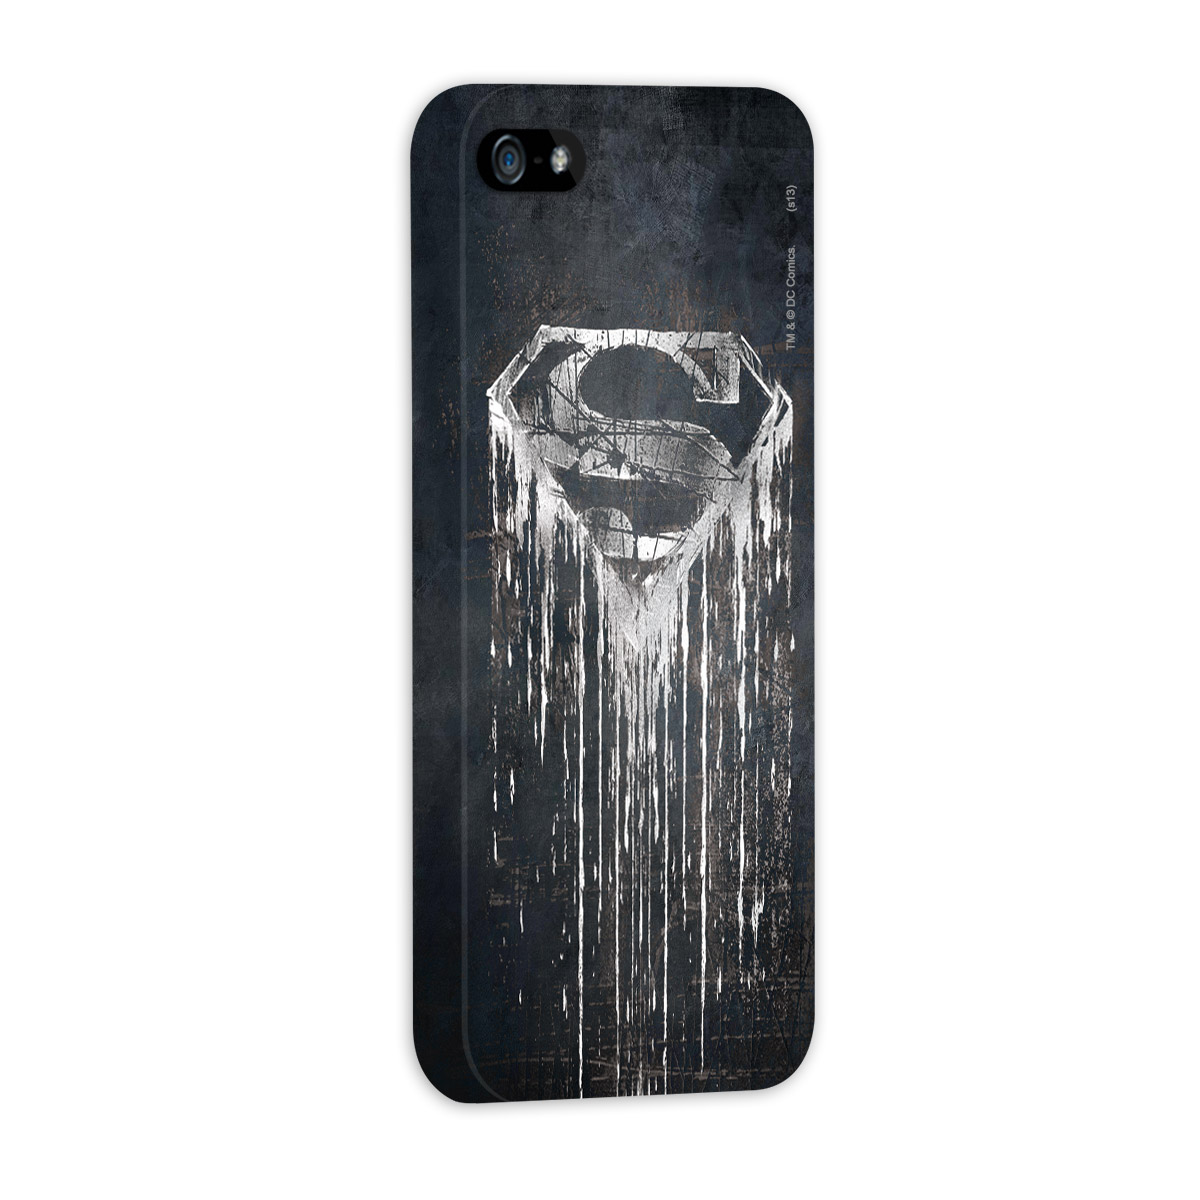 Capa de iPhone 5/5S Superman - Steel Melting